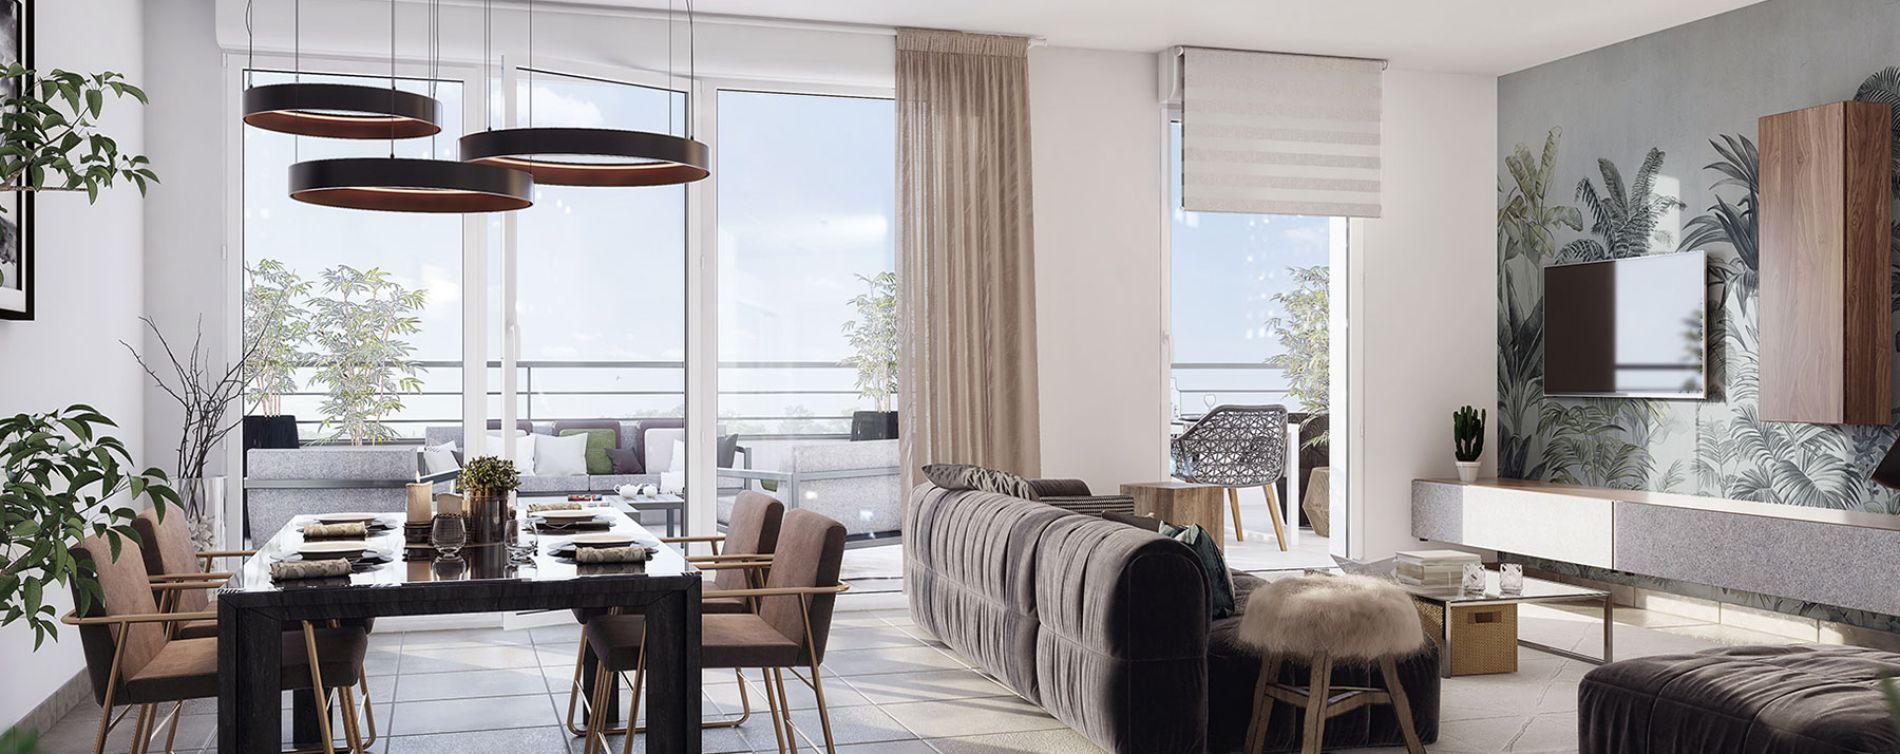 Meyreuil : programme immobilier neuve « Terra Rosa » en Loi Pinel (2)